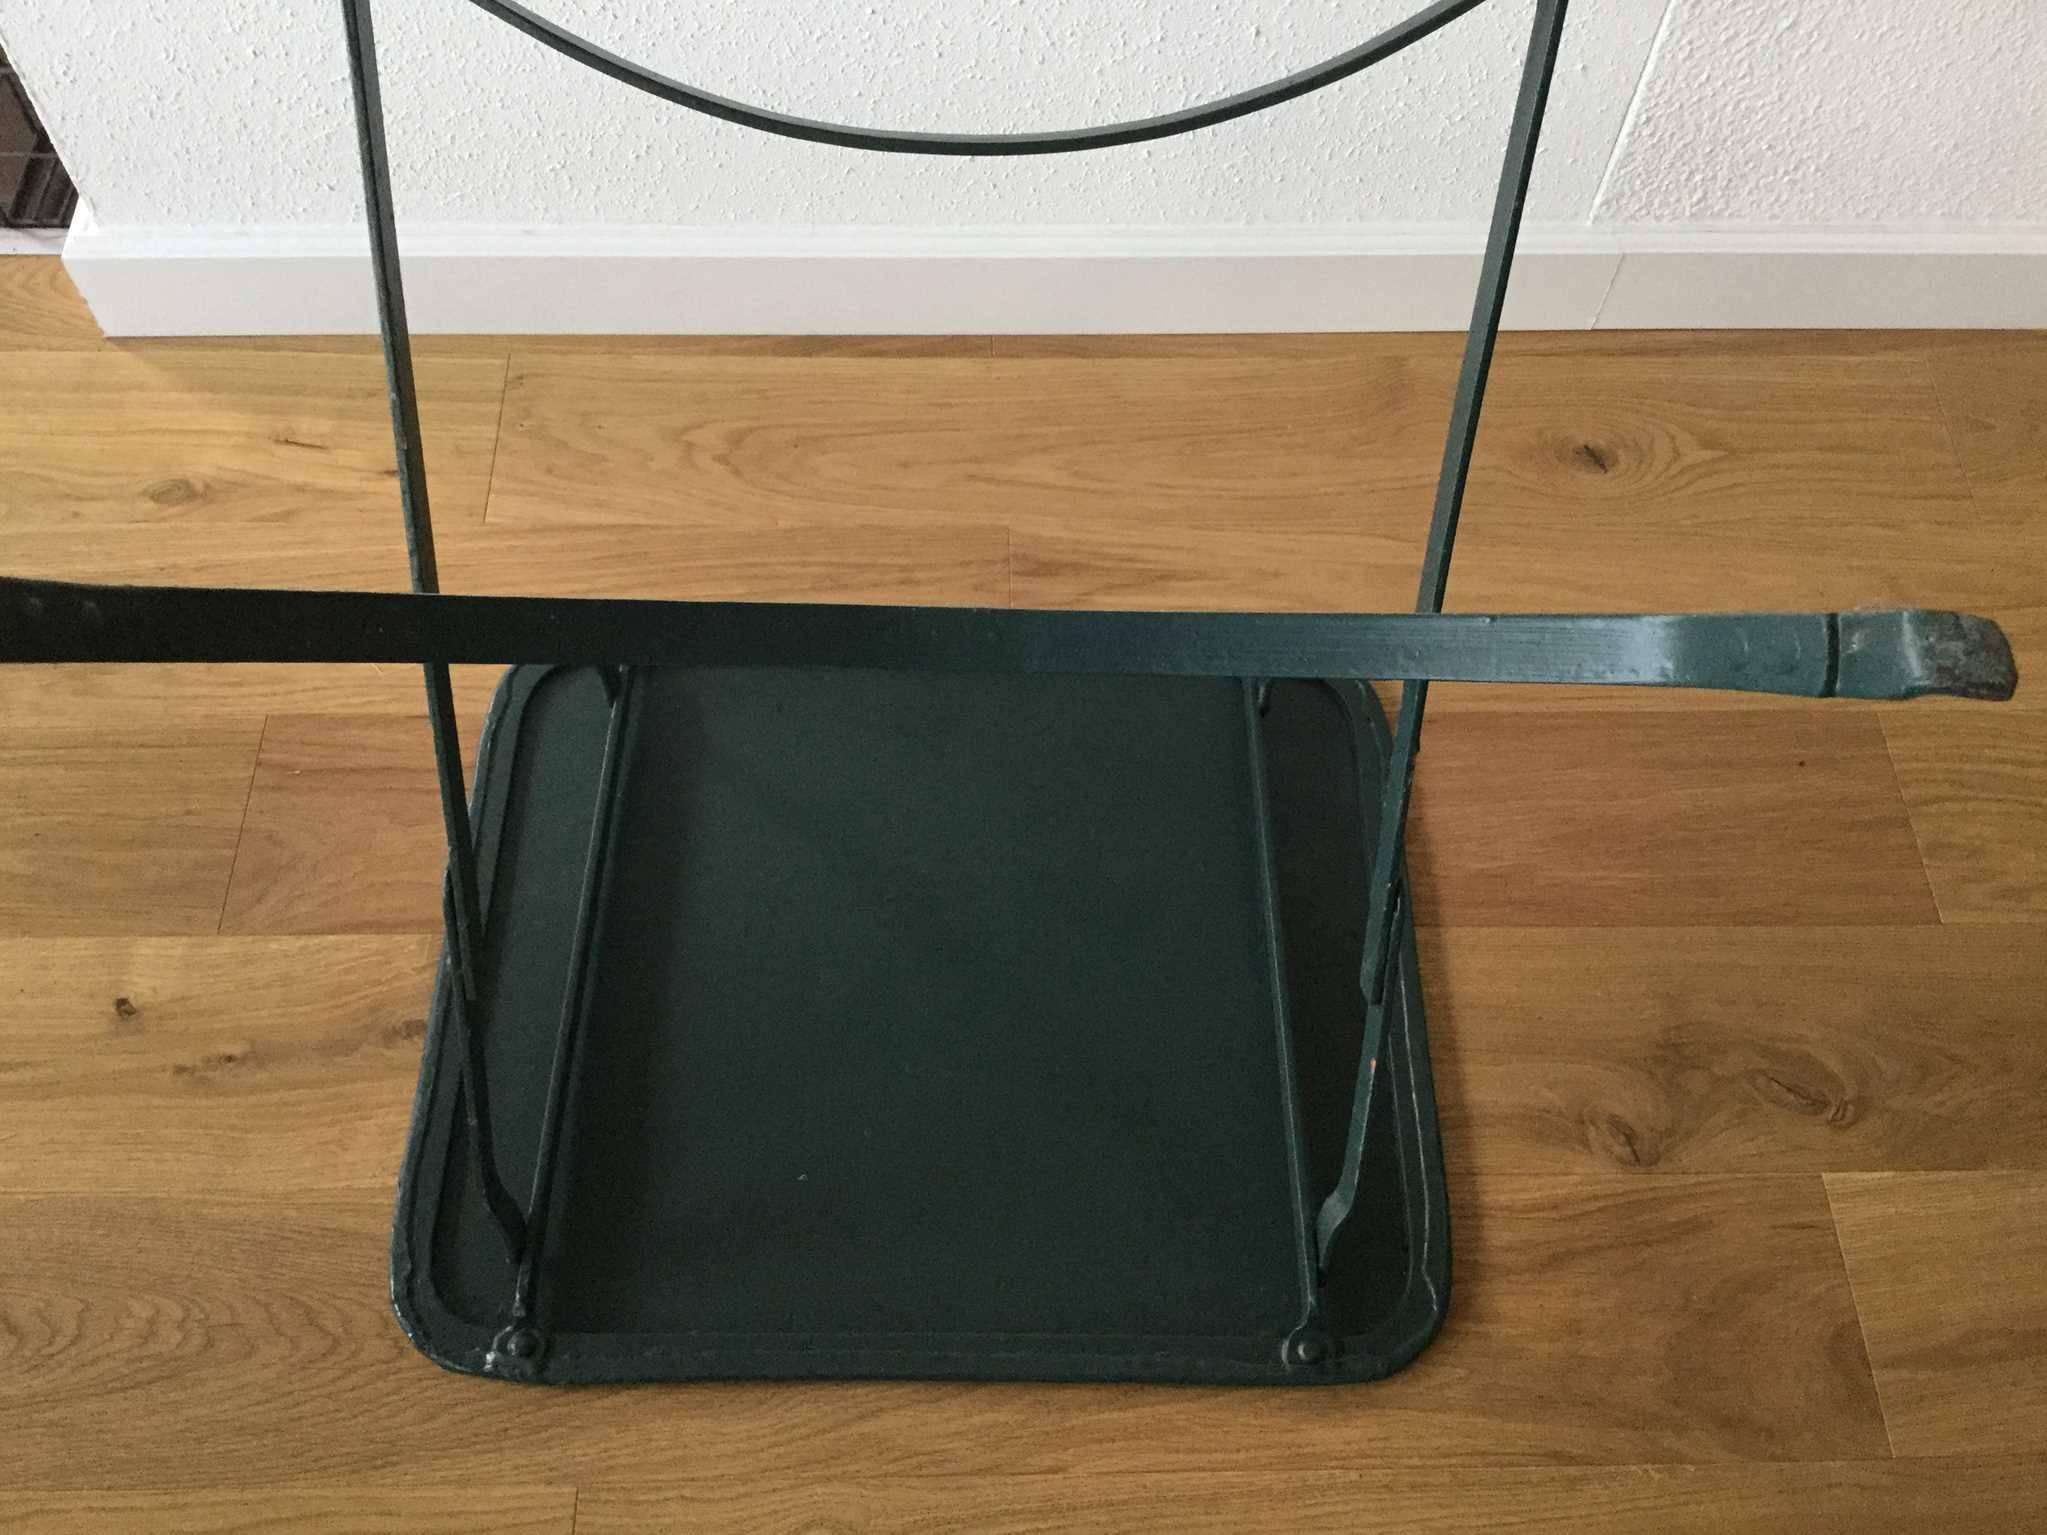 Petite table de jardin rectangulaire pliable - Gartentisch